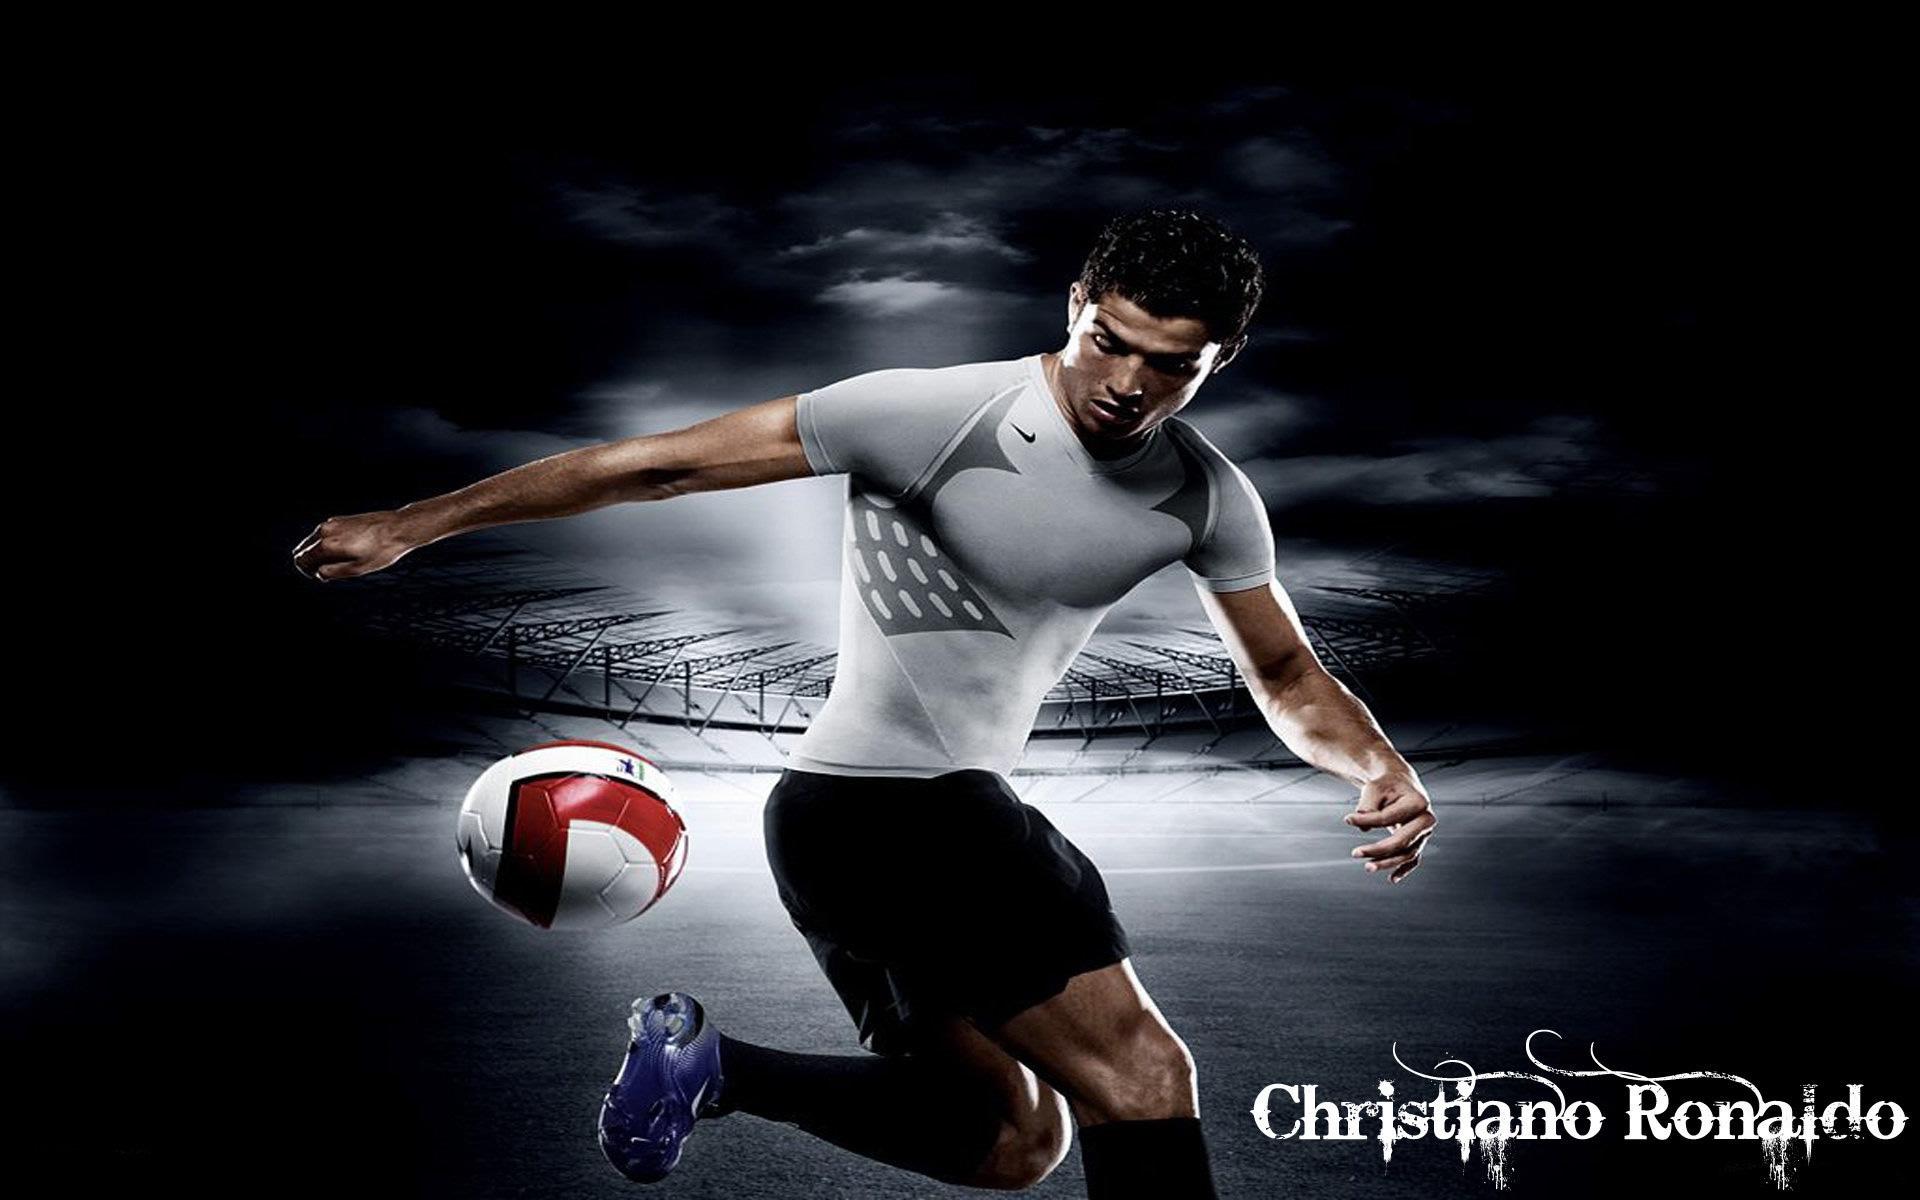 Cristiano ronaldo nike wallpaper cristiano ronaldo wallpapers - Download cr7 photos ...